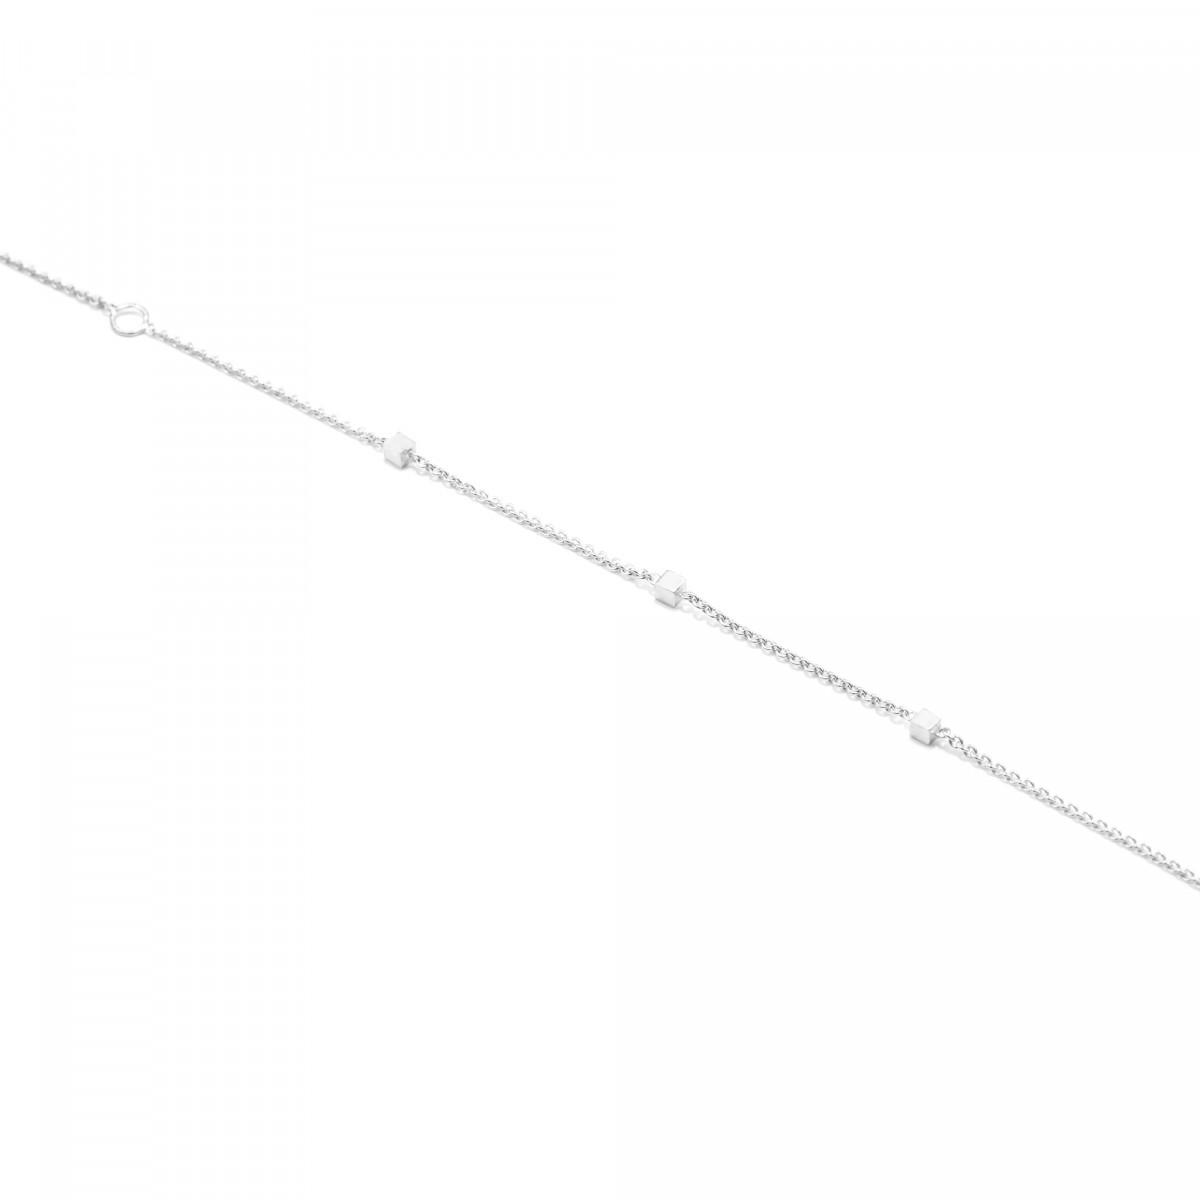 Jonathan Radetz Jewellery, Armband fineCUBE, Silber 925, Sterlingsilber, Länge 16 -18 cm, Cube 2 mm, Handmade in Germany